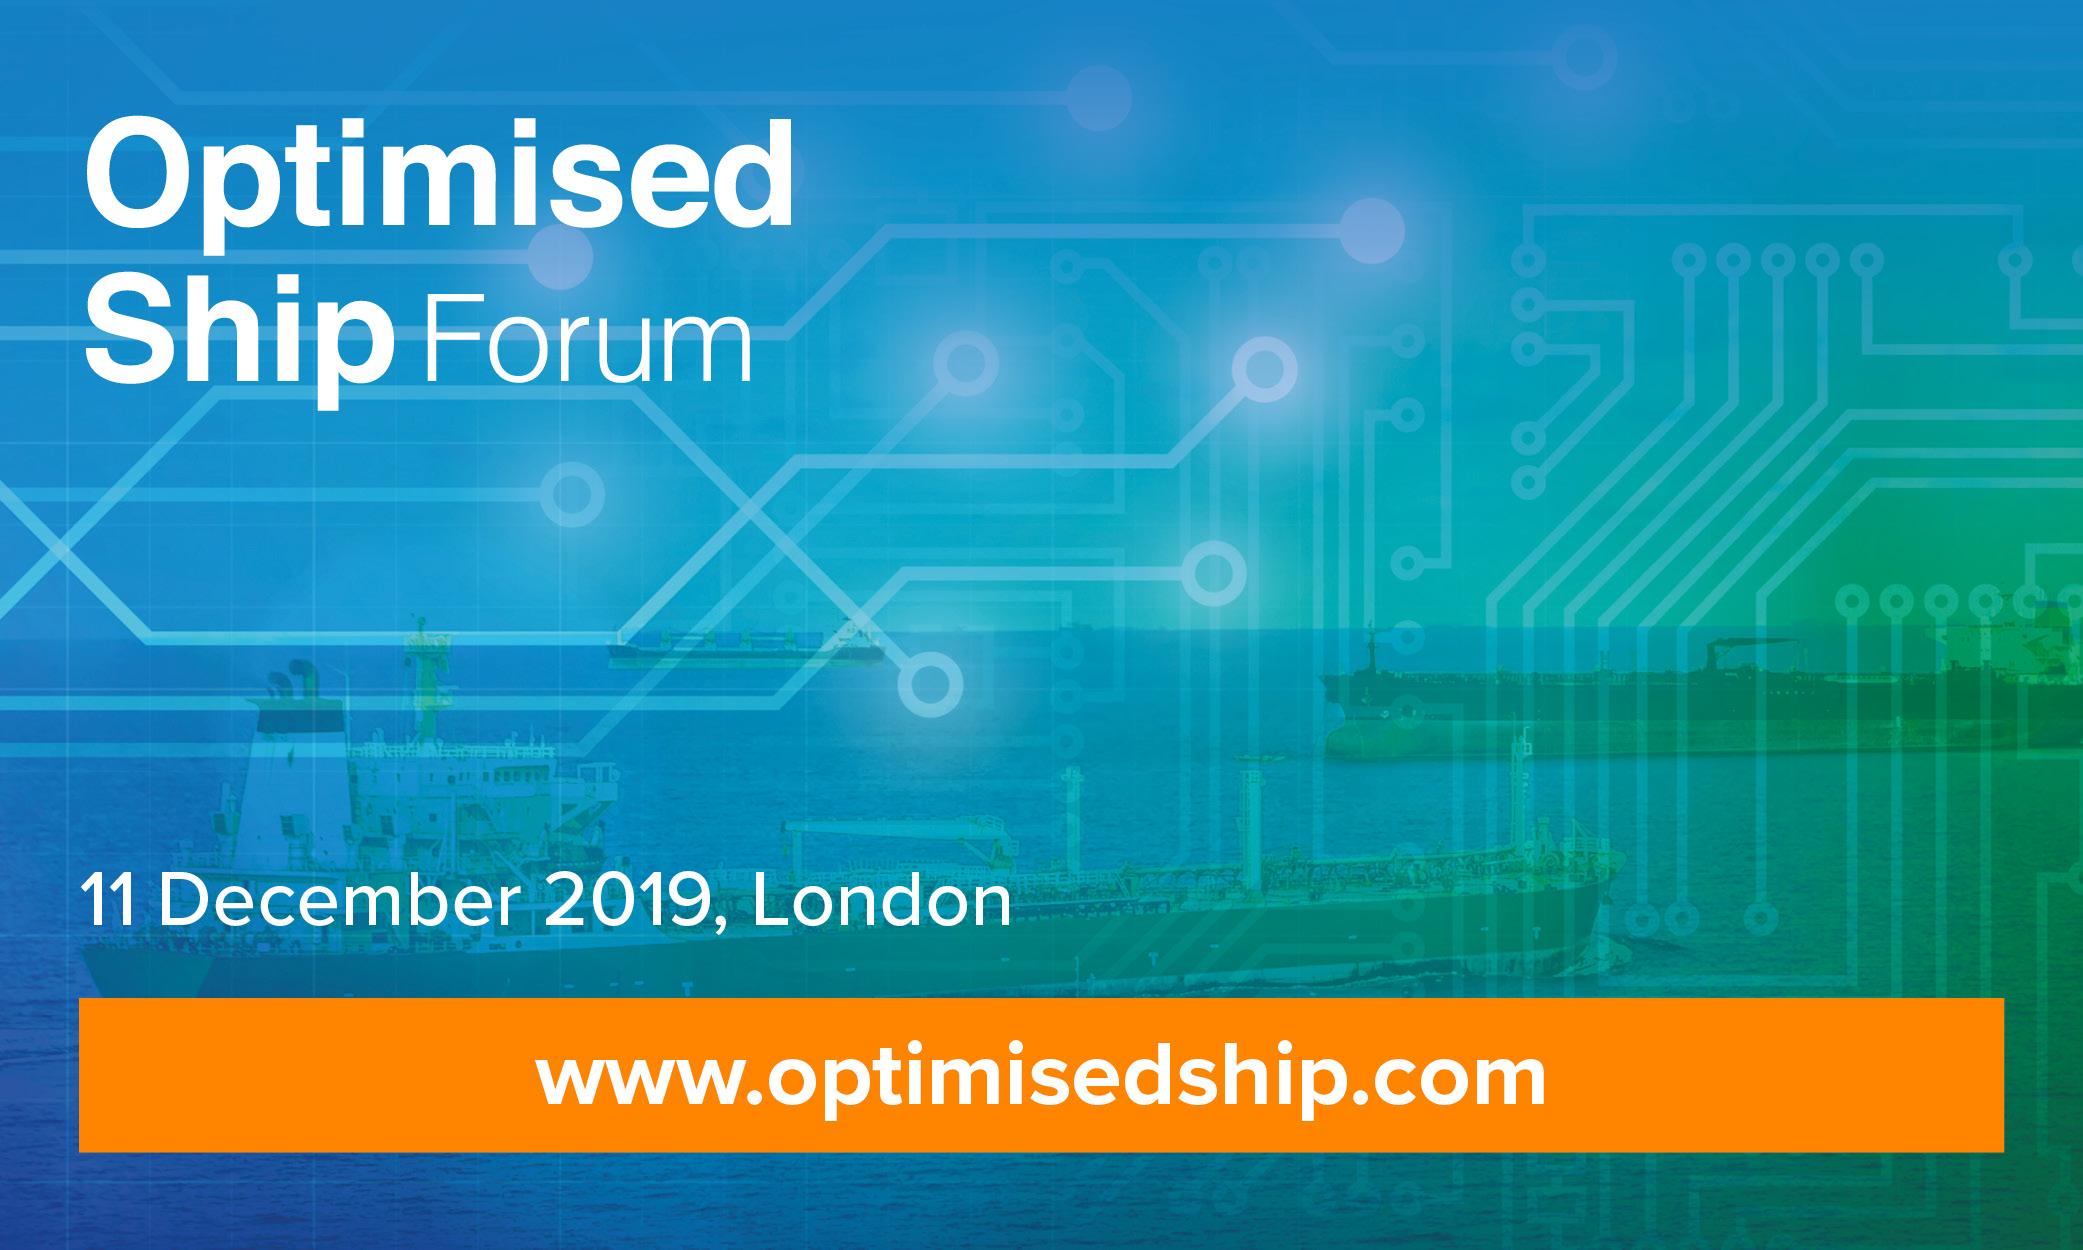 Optimised Ship Forum London 2019